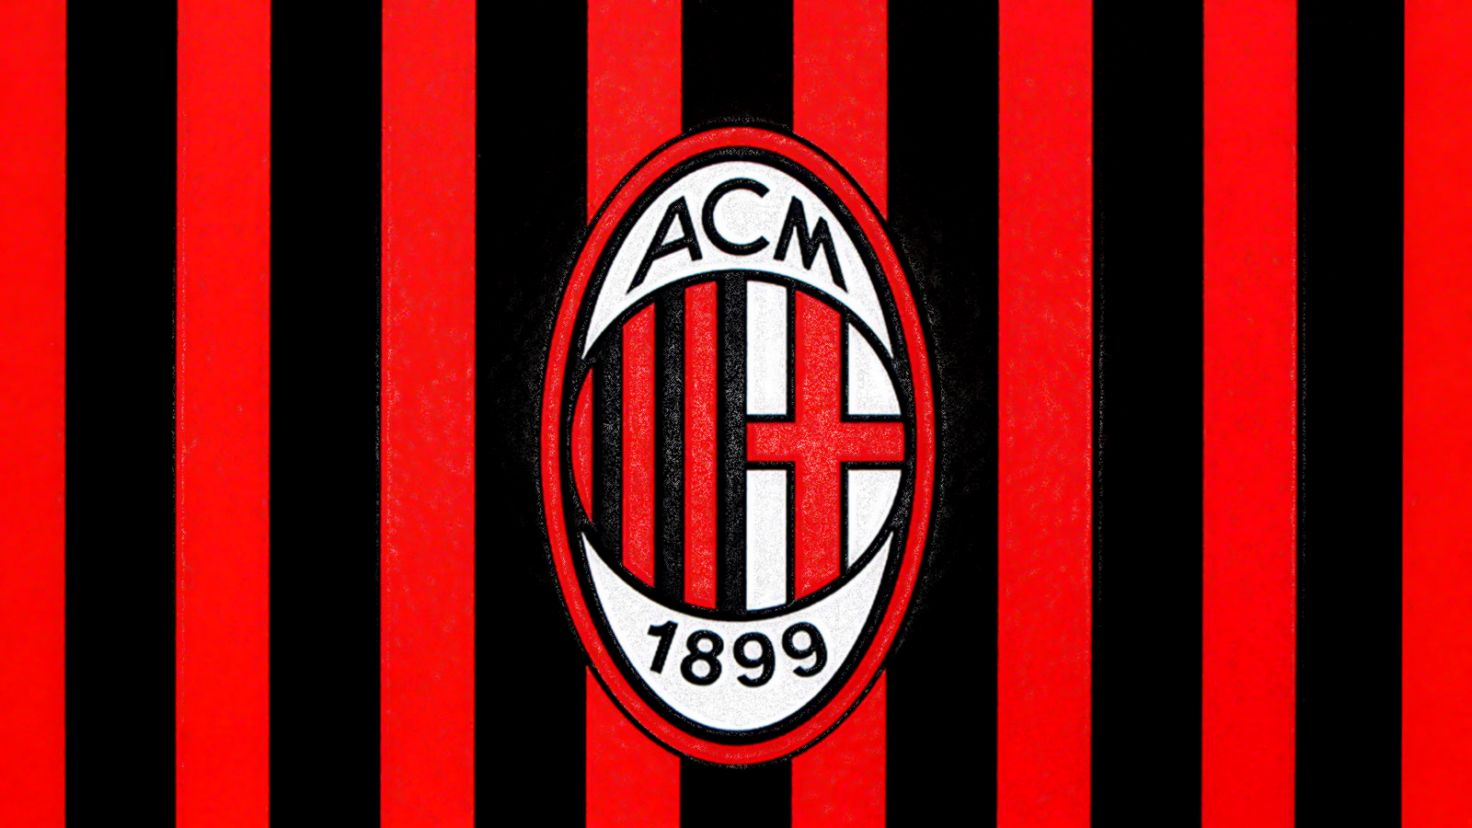 Ac Milan Black Red Wallpaper Hd Bitonarnia